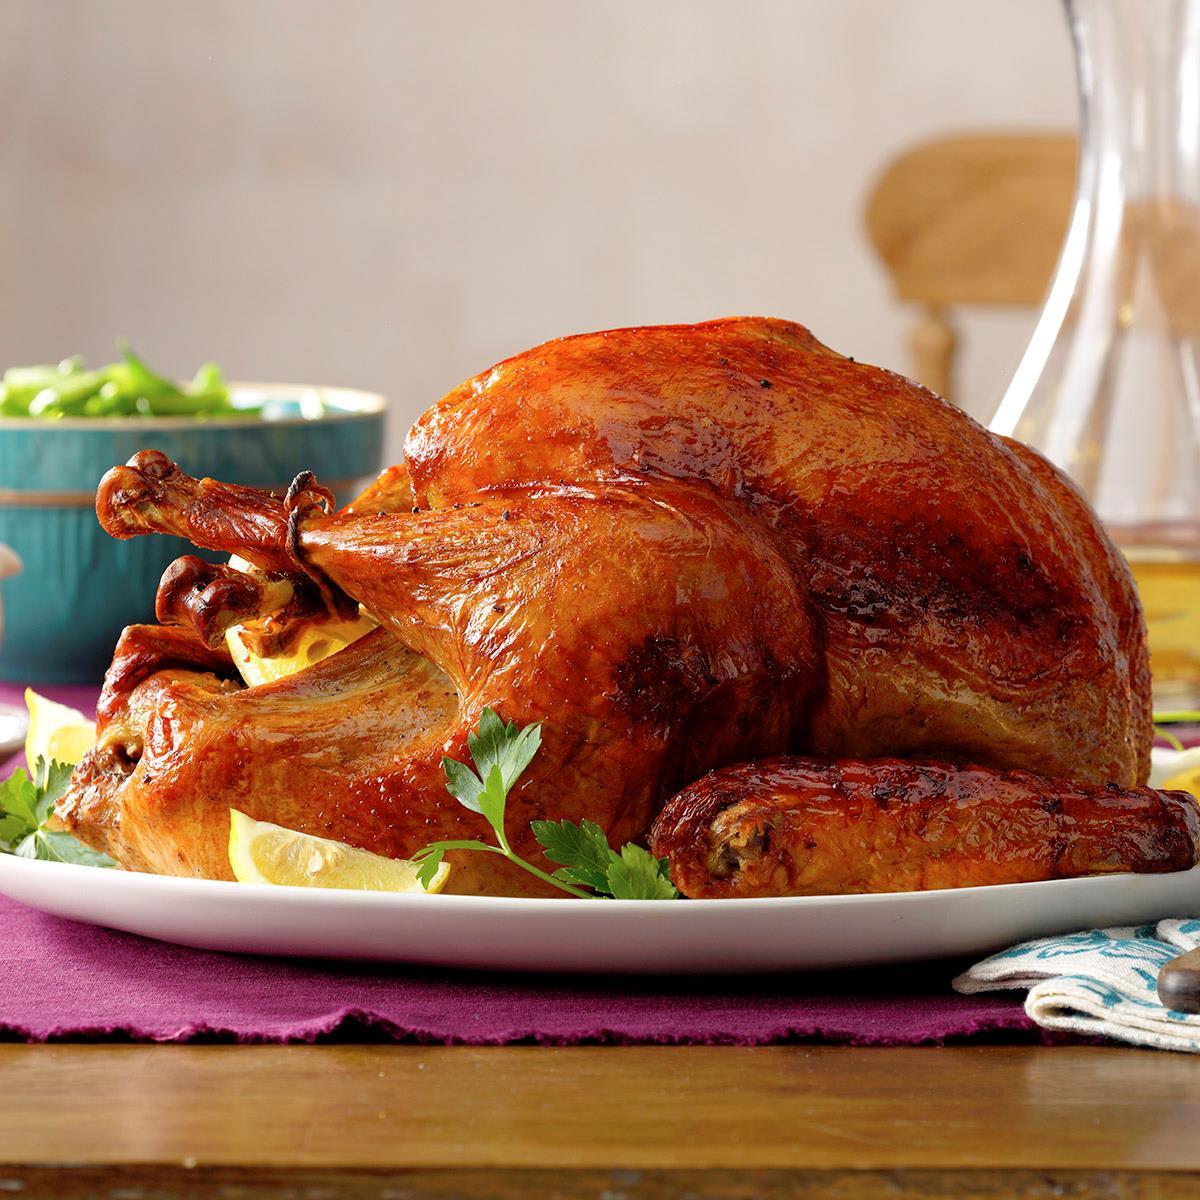 Thanksgiving Turkey Image  The Ultimate Thanksgiving Dinner Menu